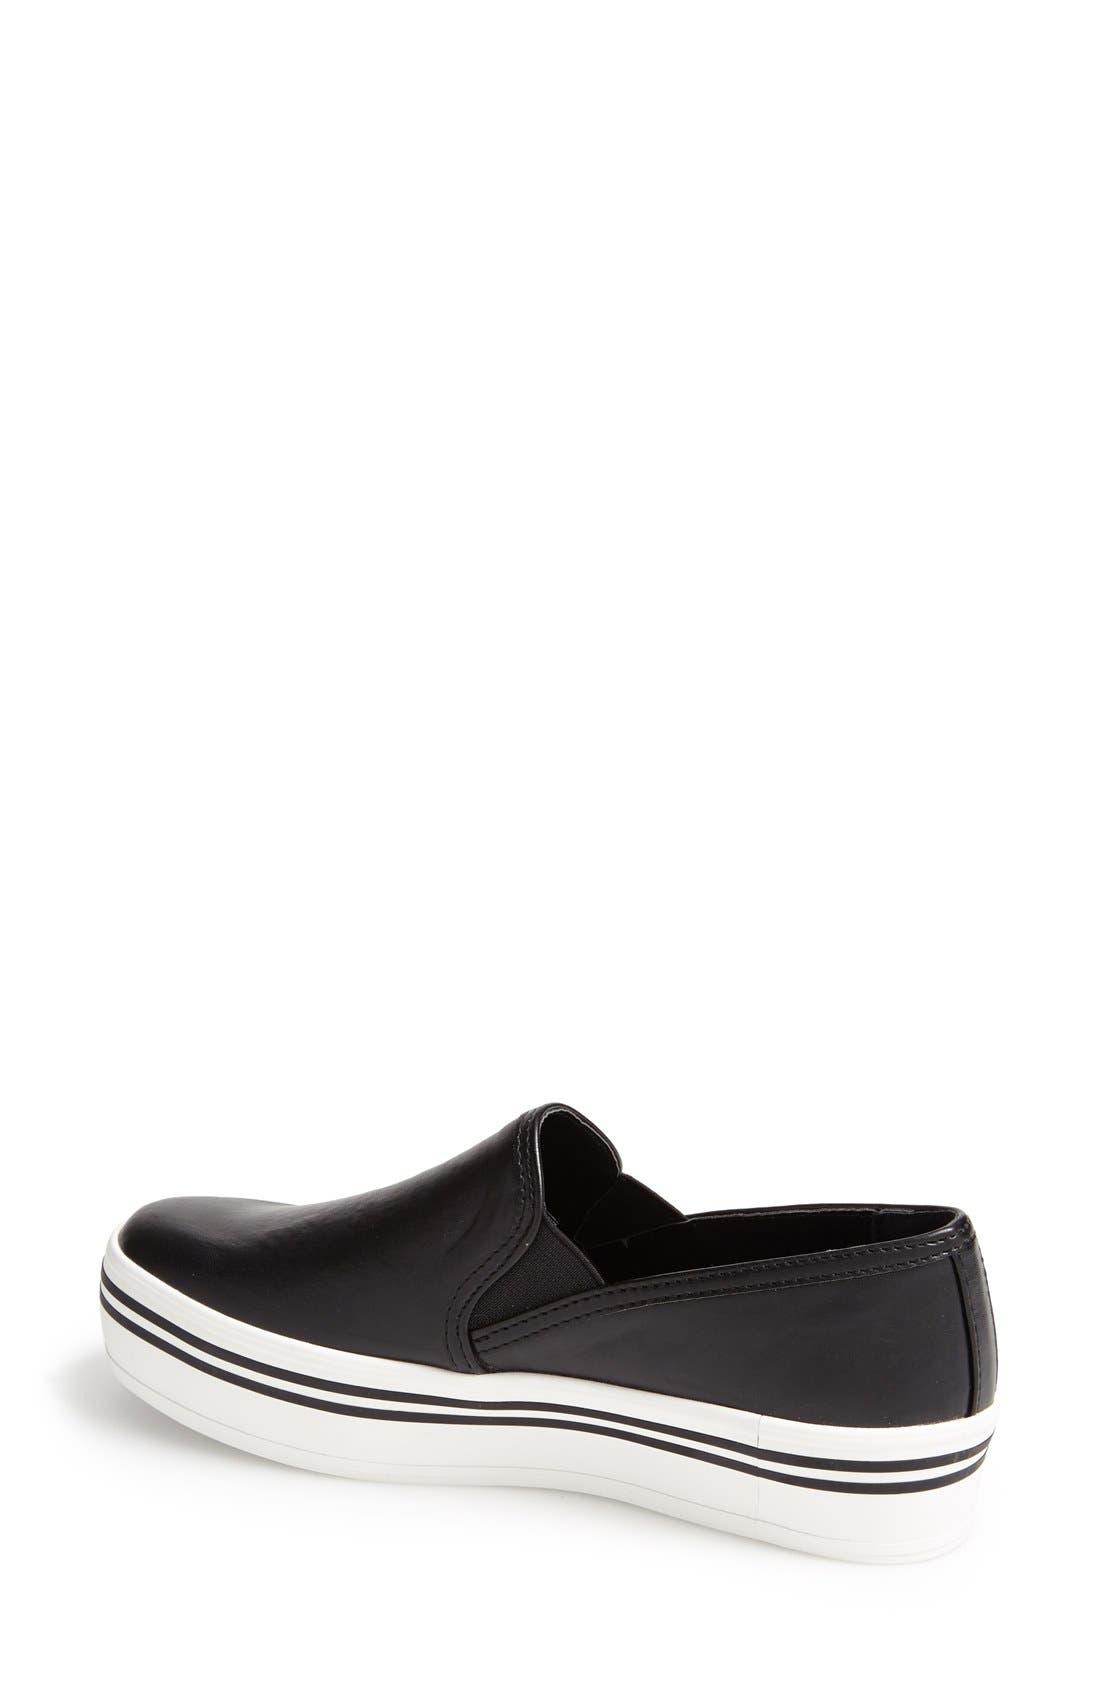 Alternate Image 3  - DV by Dolce Vita 'Jinsy' Slip-On Sneaker (Women)